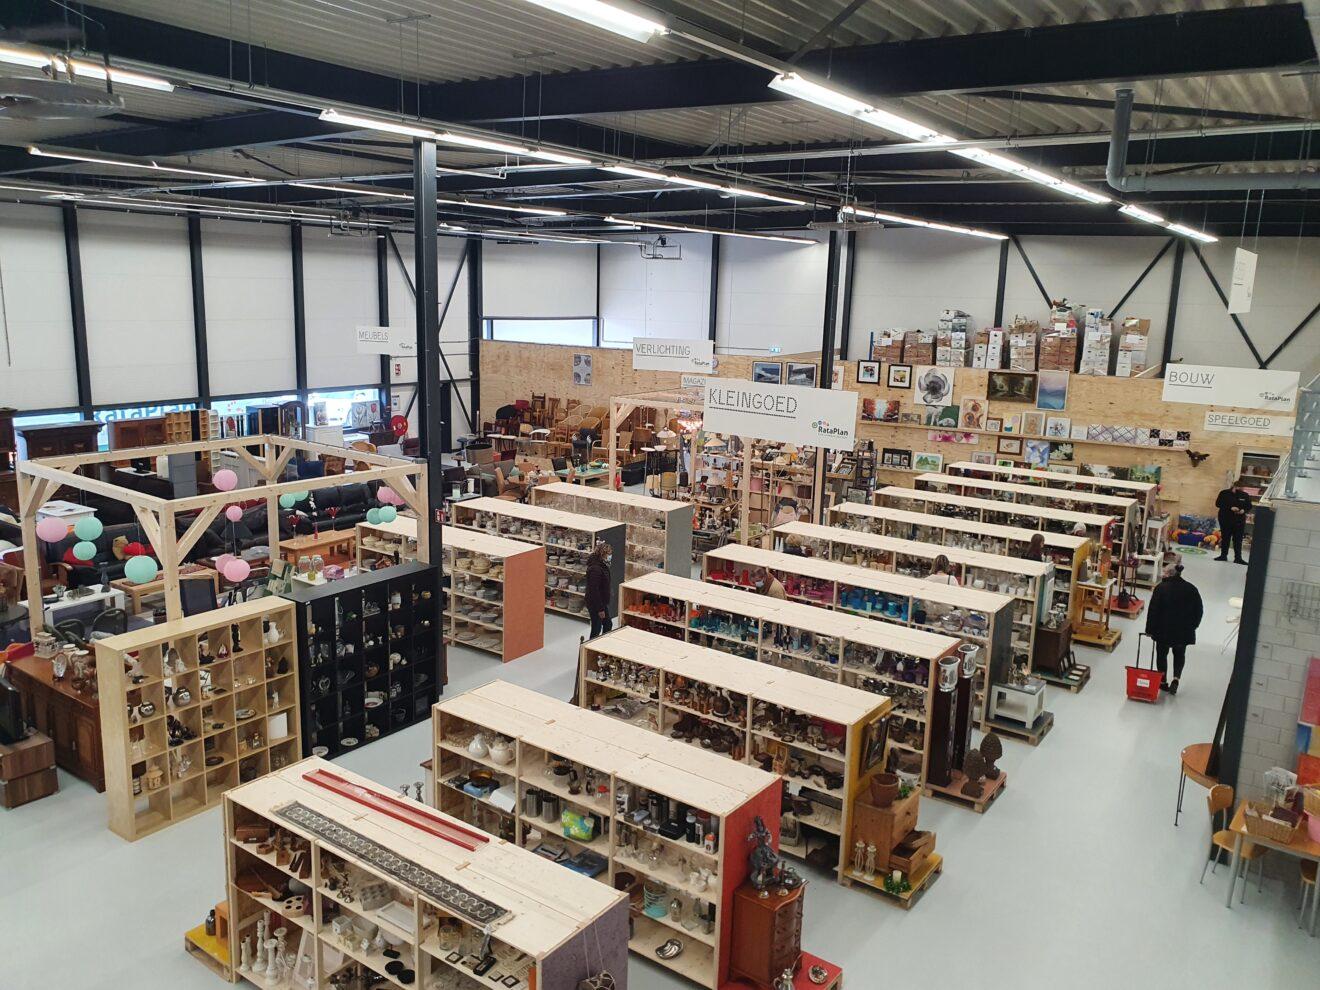 Opening kringloopwinkel Rataplan in Hillegom